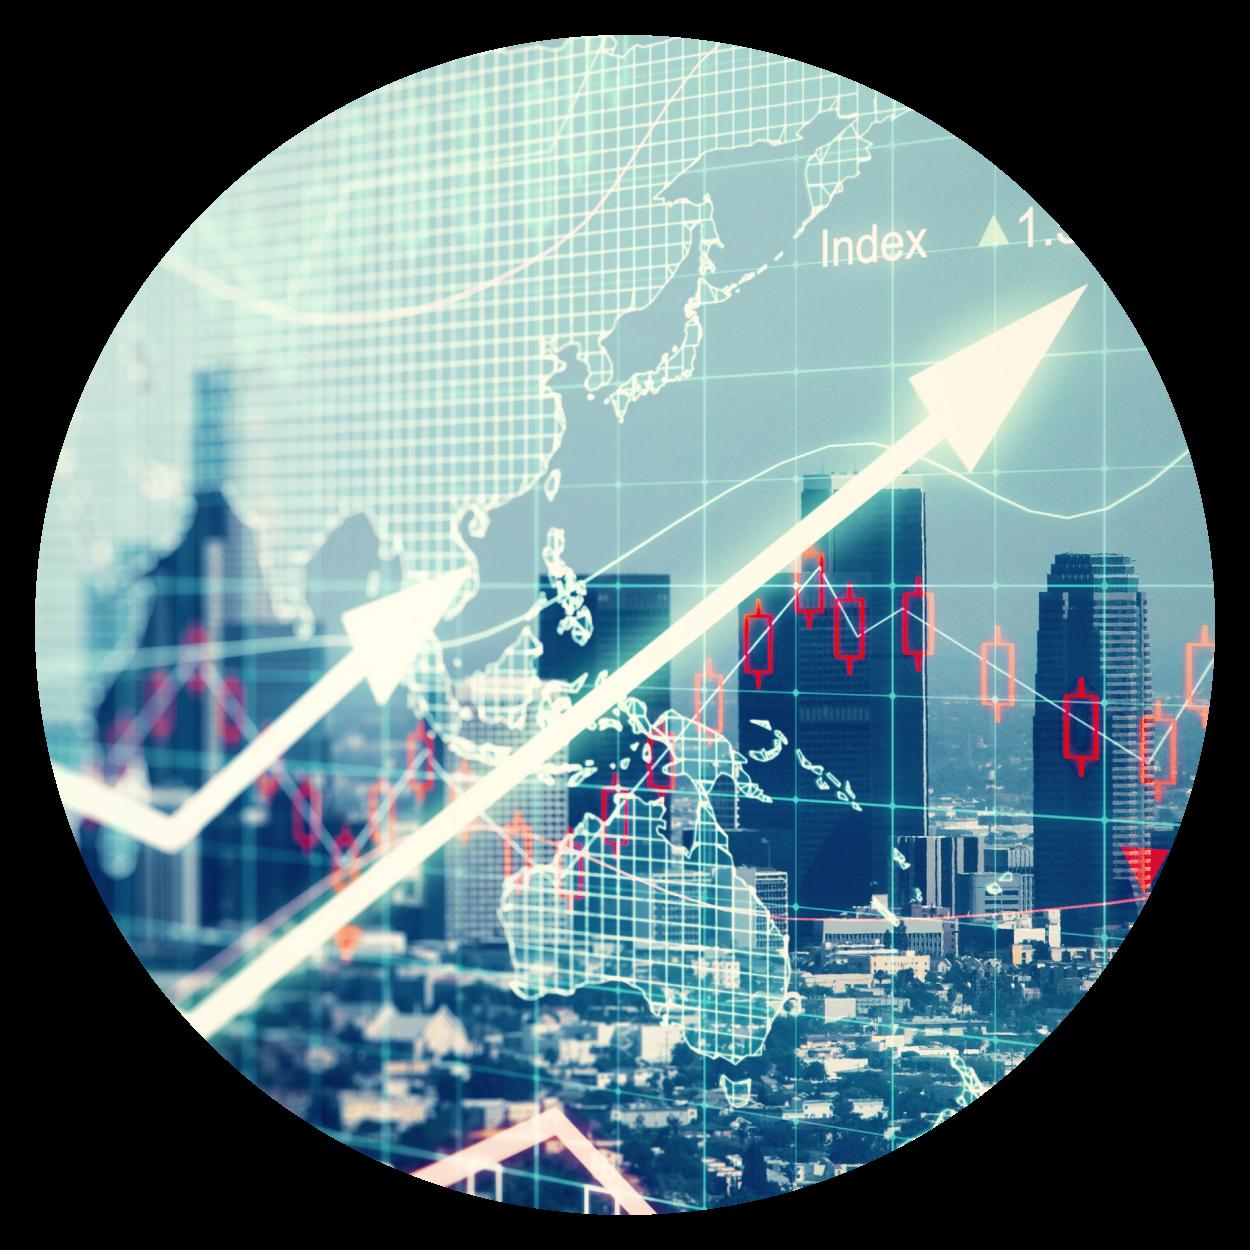 Logo-OTA Market Manager Optimization and Distribution